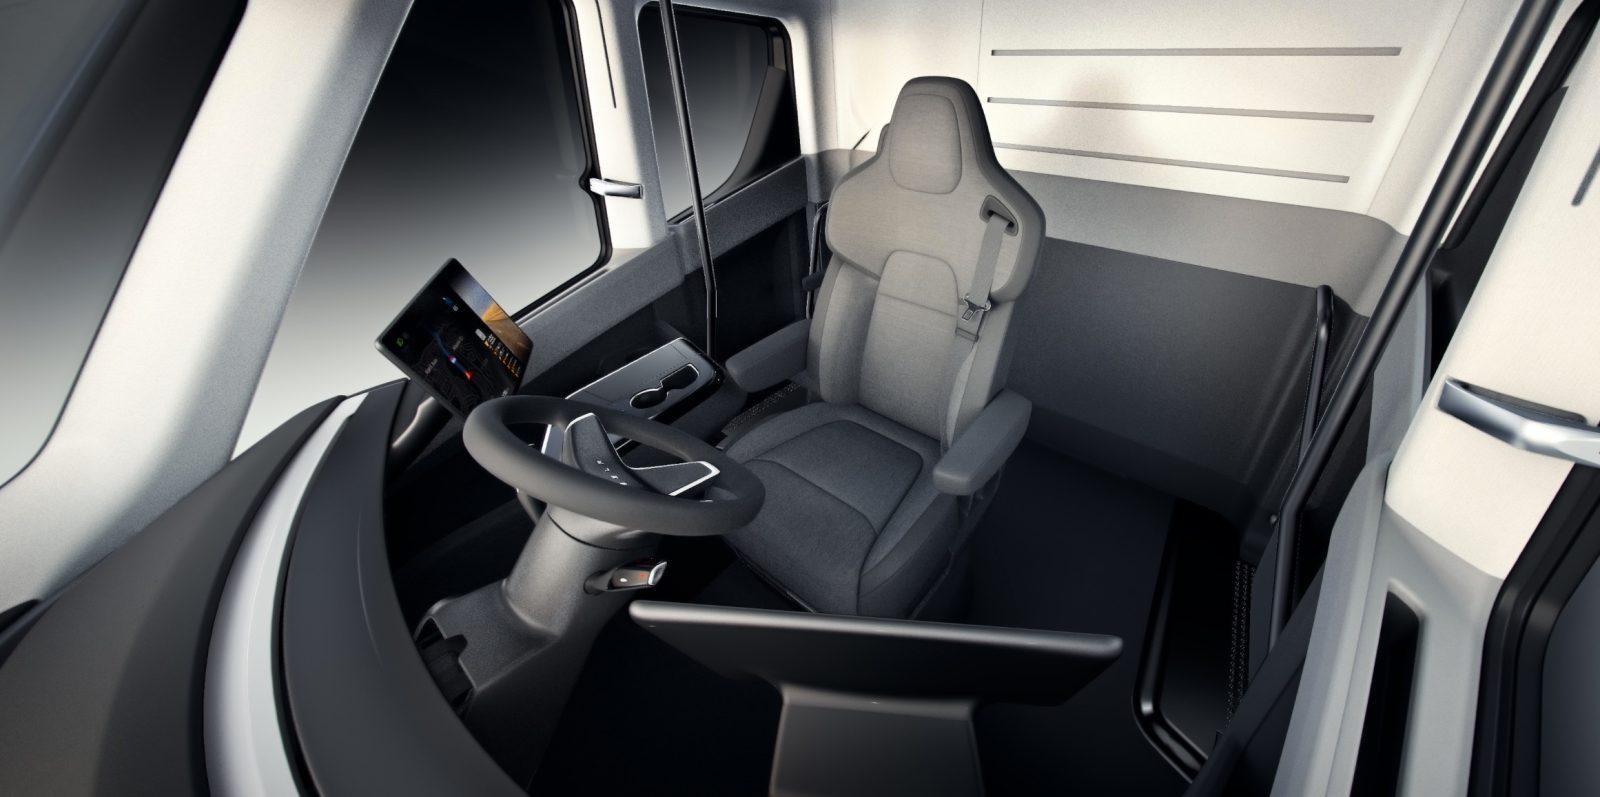 Tesla Designs Its Own Semi Truck Seat Suspension For Tesla